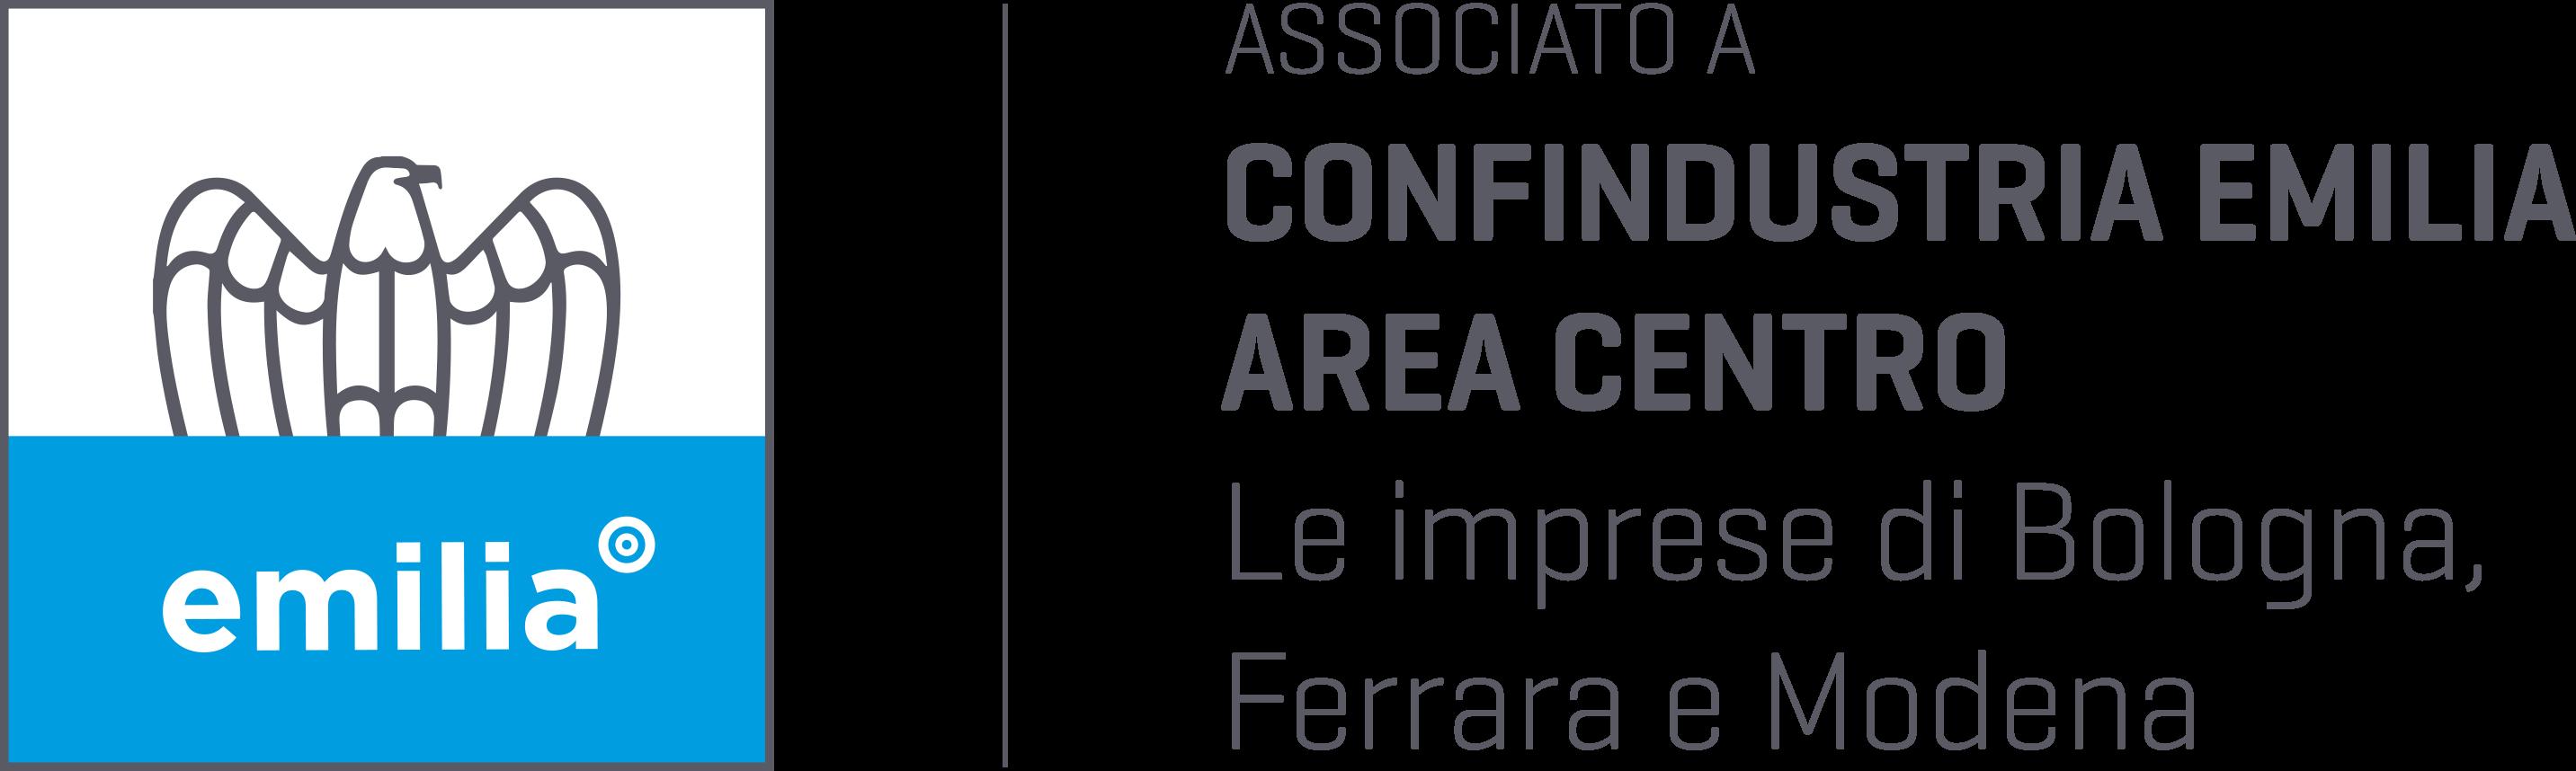 Logo di Confindustria Emilia Romagna Area Centro